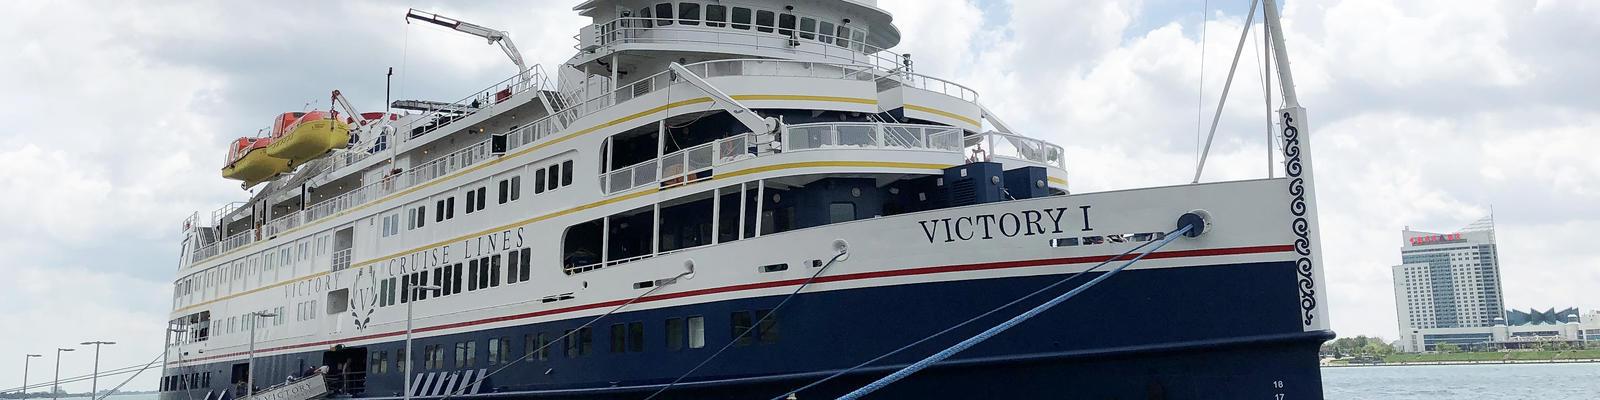 Victory I (Photo: Jason Frye/Cruise Critic)